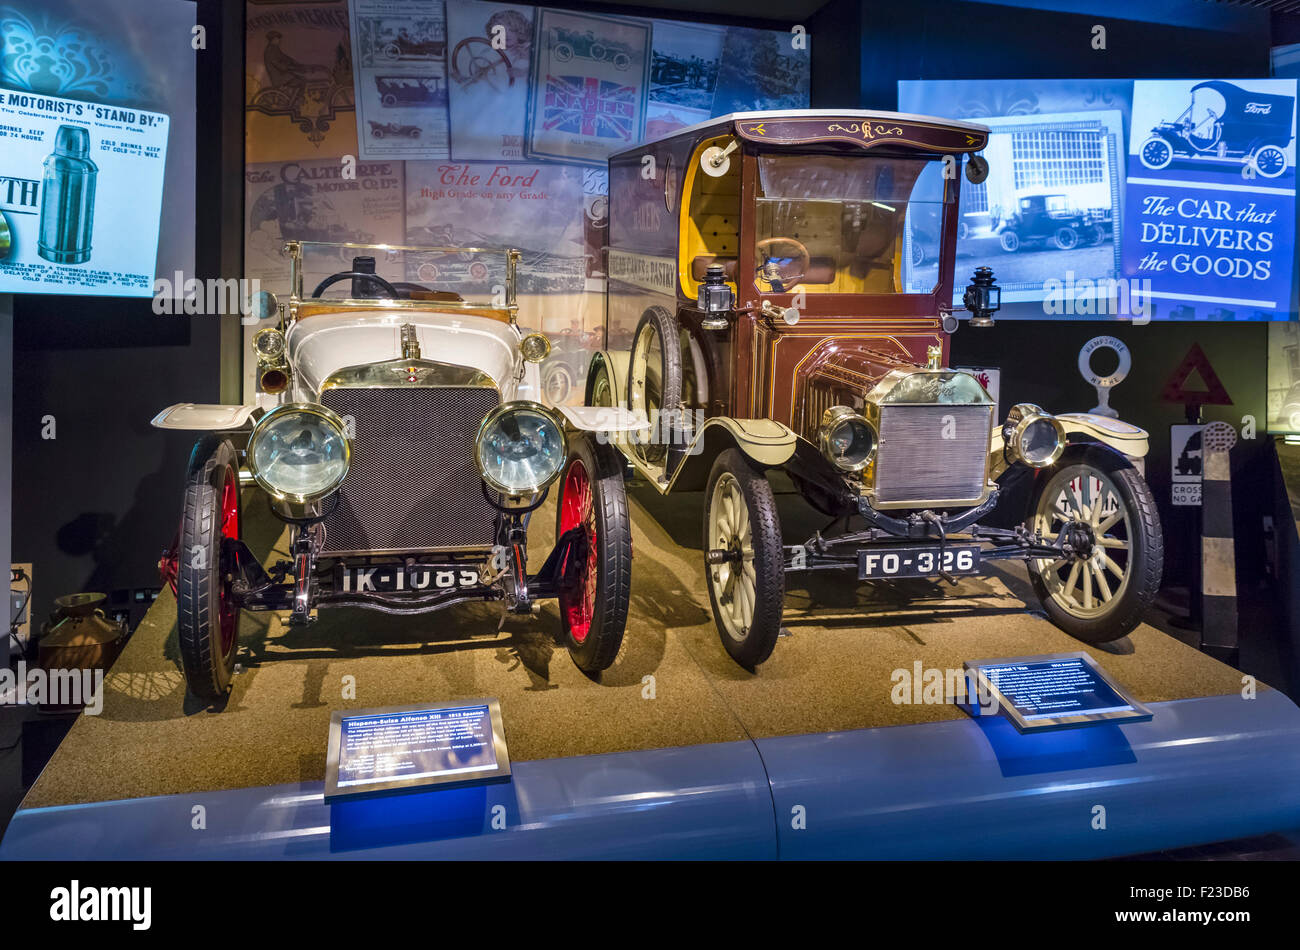 Ein 1912 Hispano-Suize Alfonso XIII und ein 1914 Ford Model T van, National Motor Museum in Beaulieu, Hampshire, Stockbild